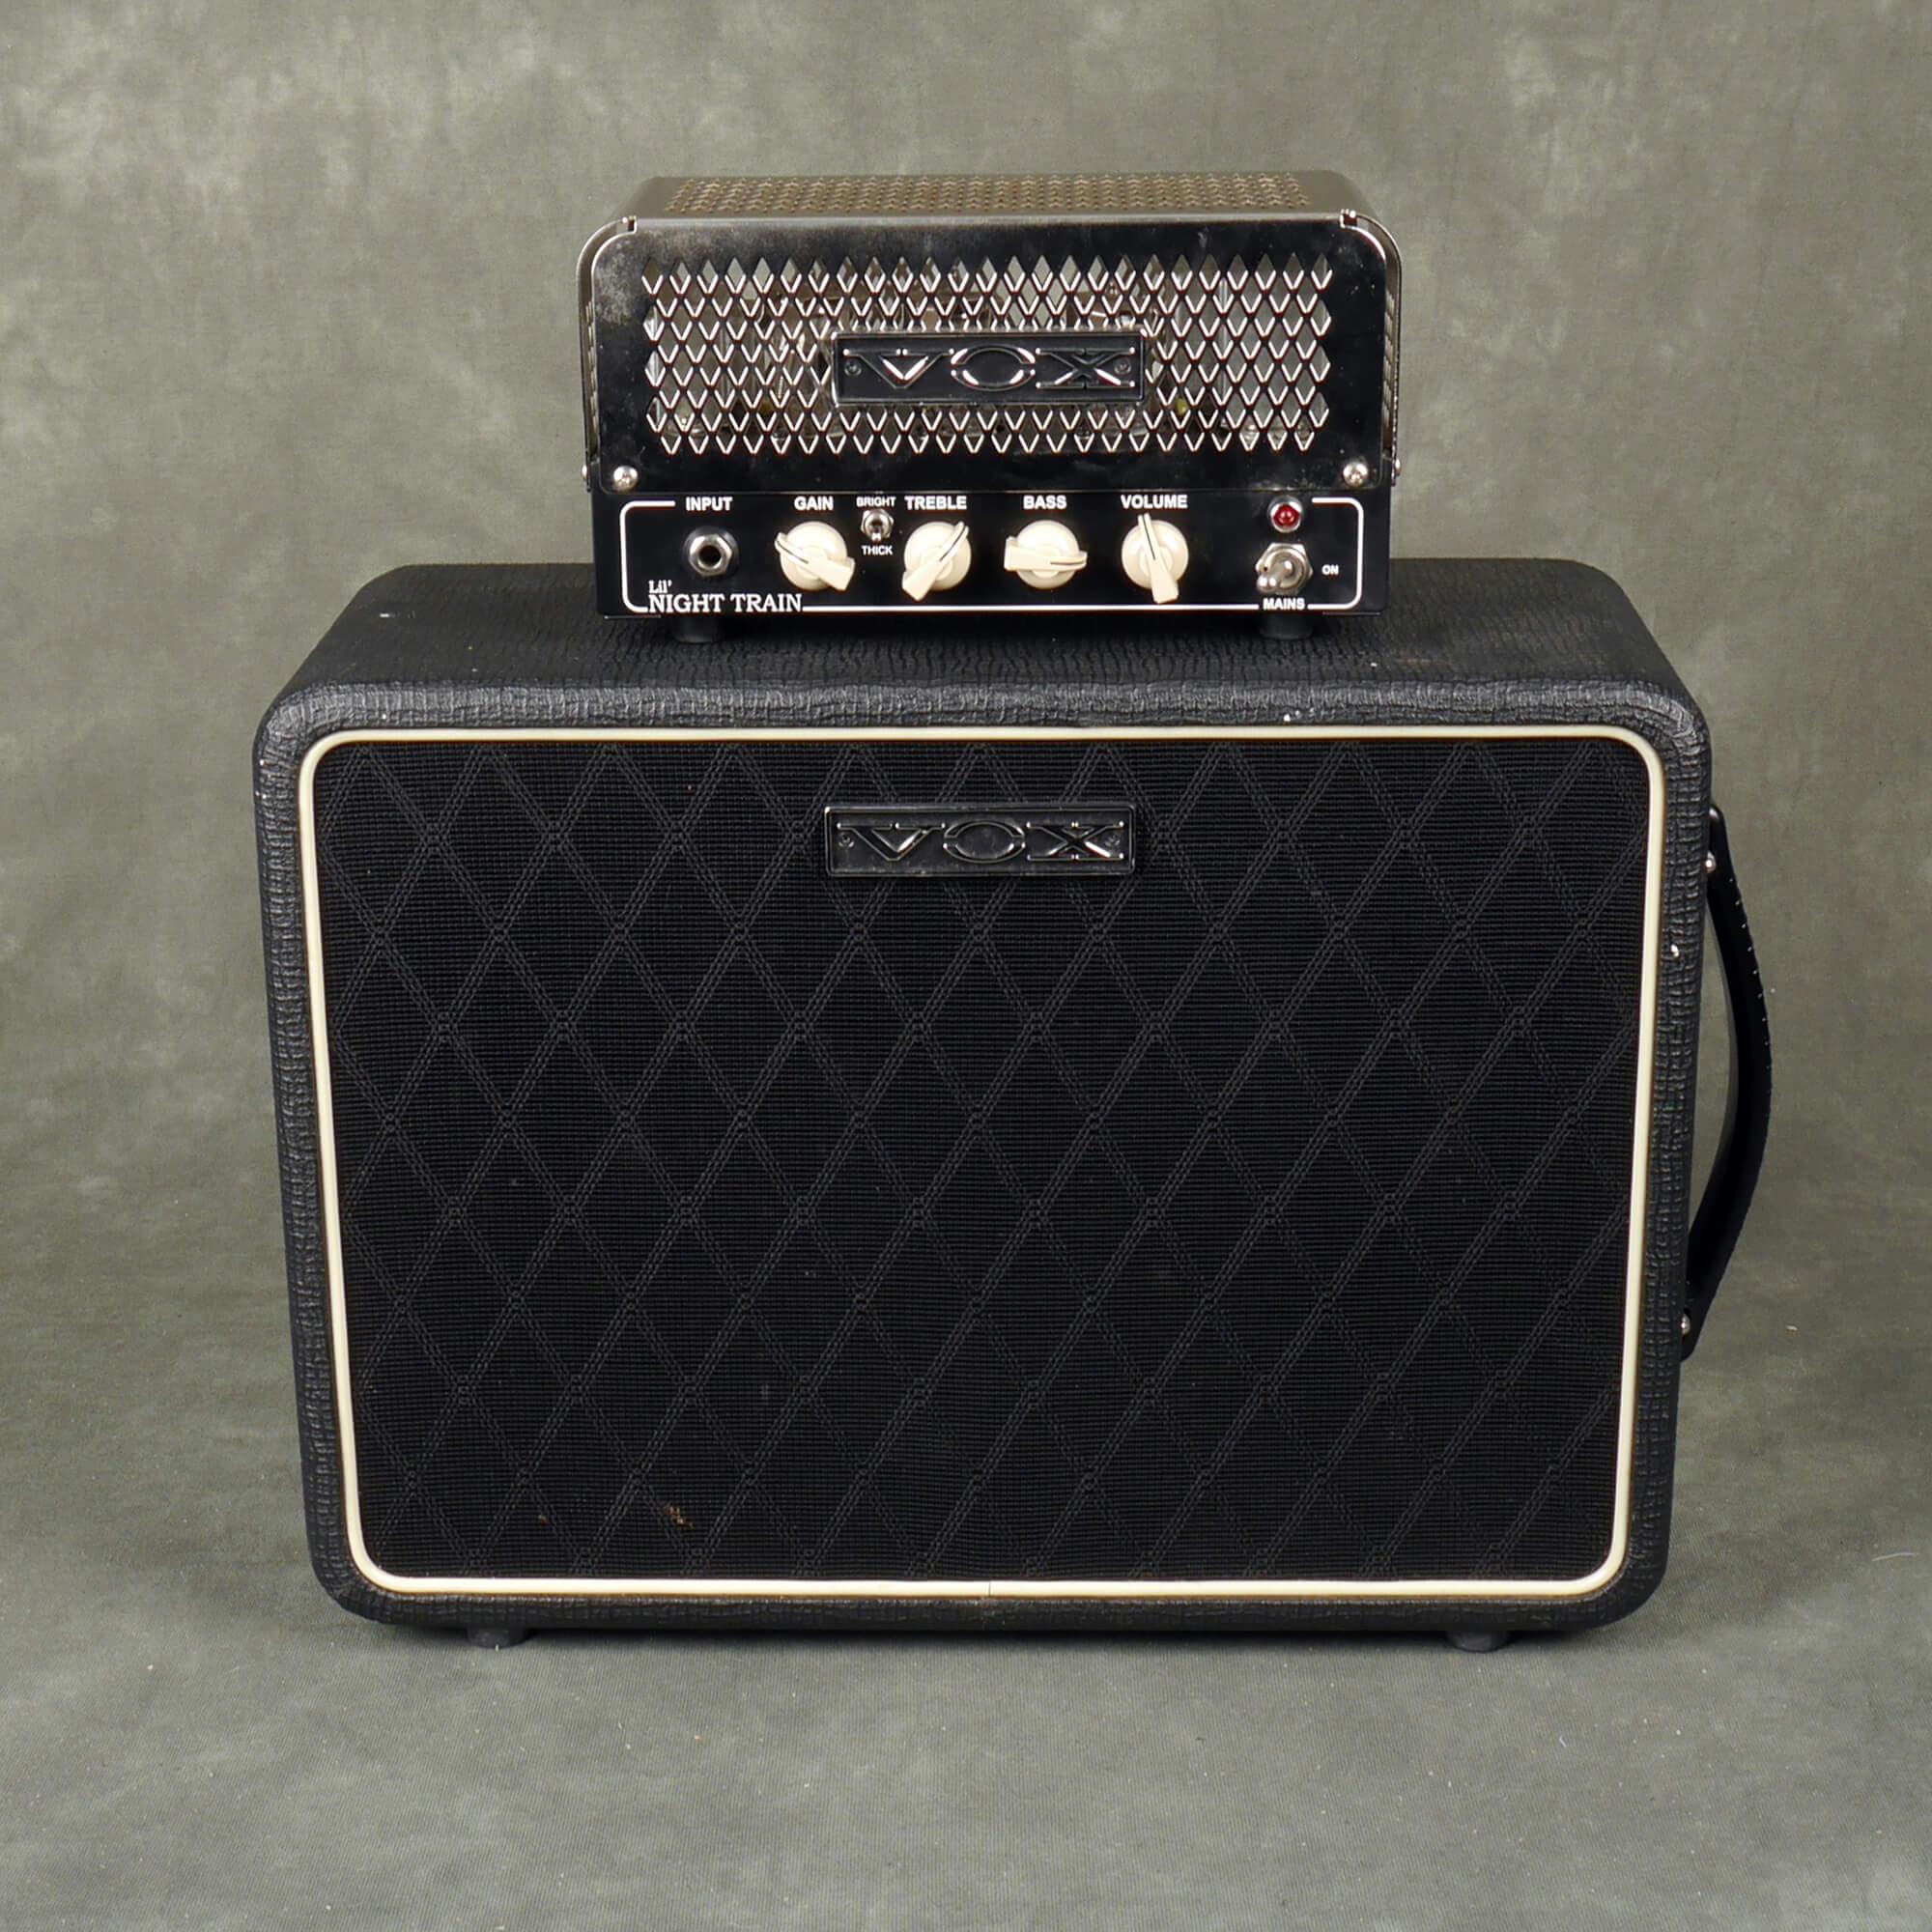 Vox Lil Nighttrain Amplifier Head & V110NT Speaker Cab - 2nd Hand